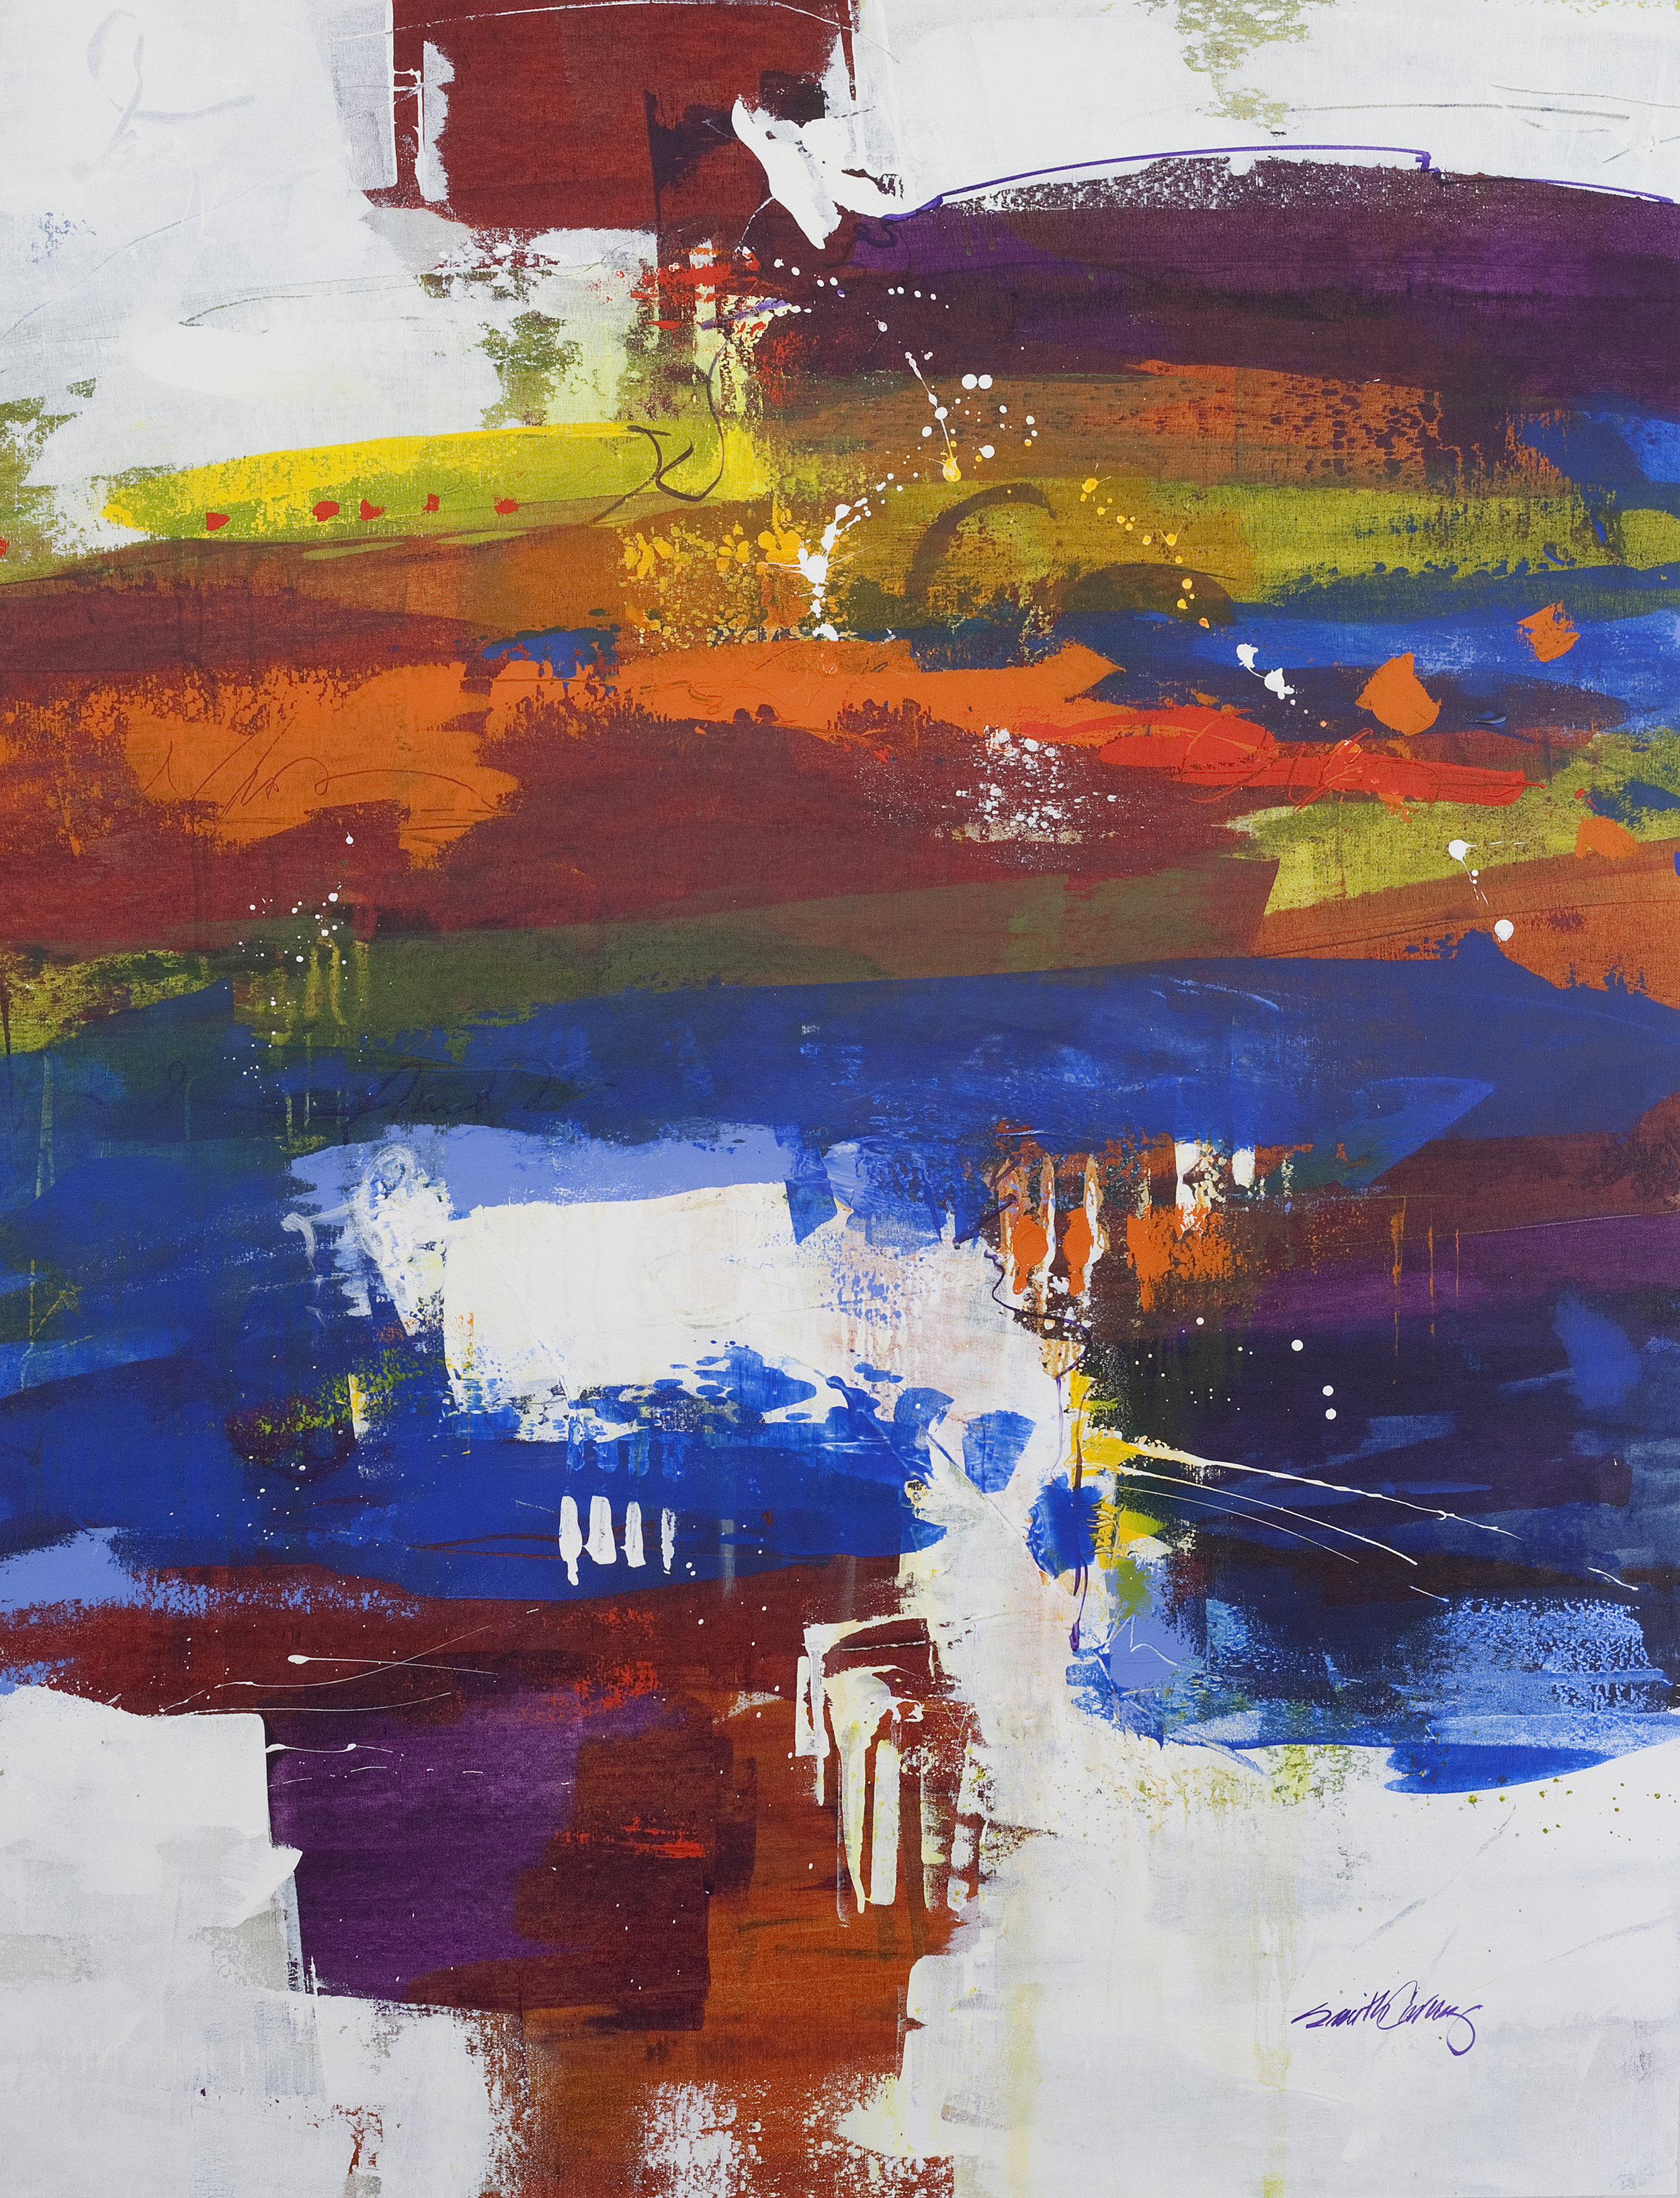 30x50 on canvas